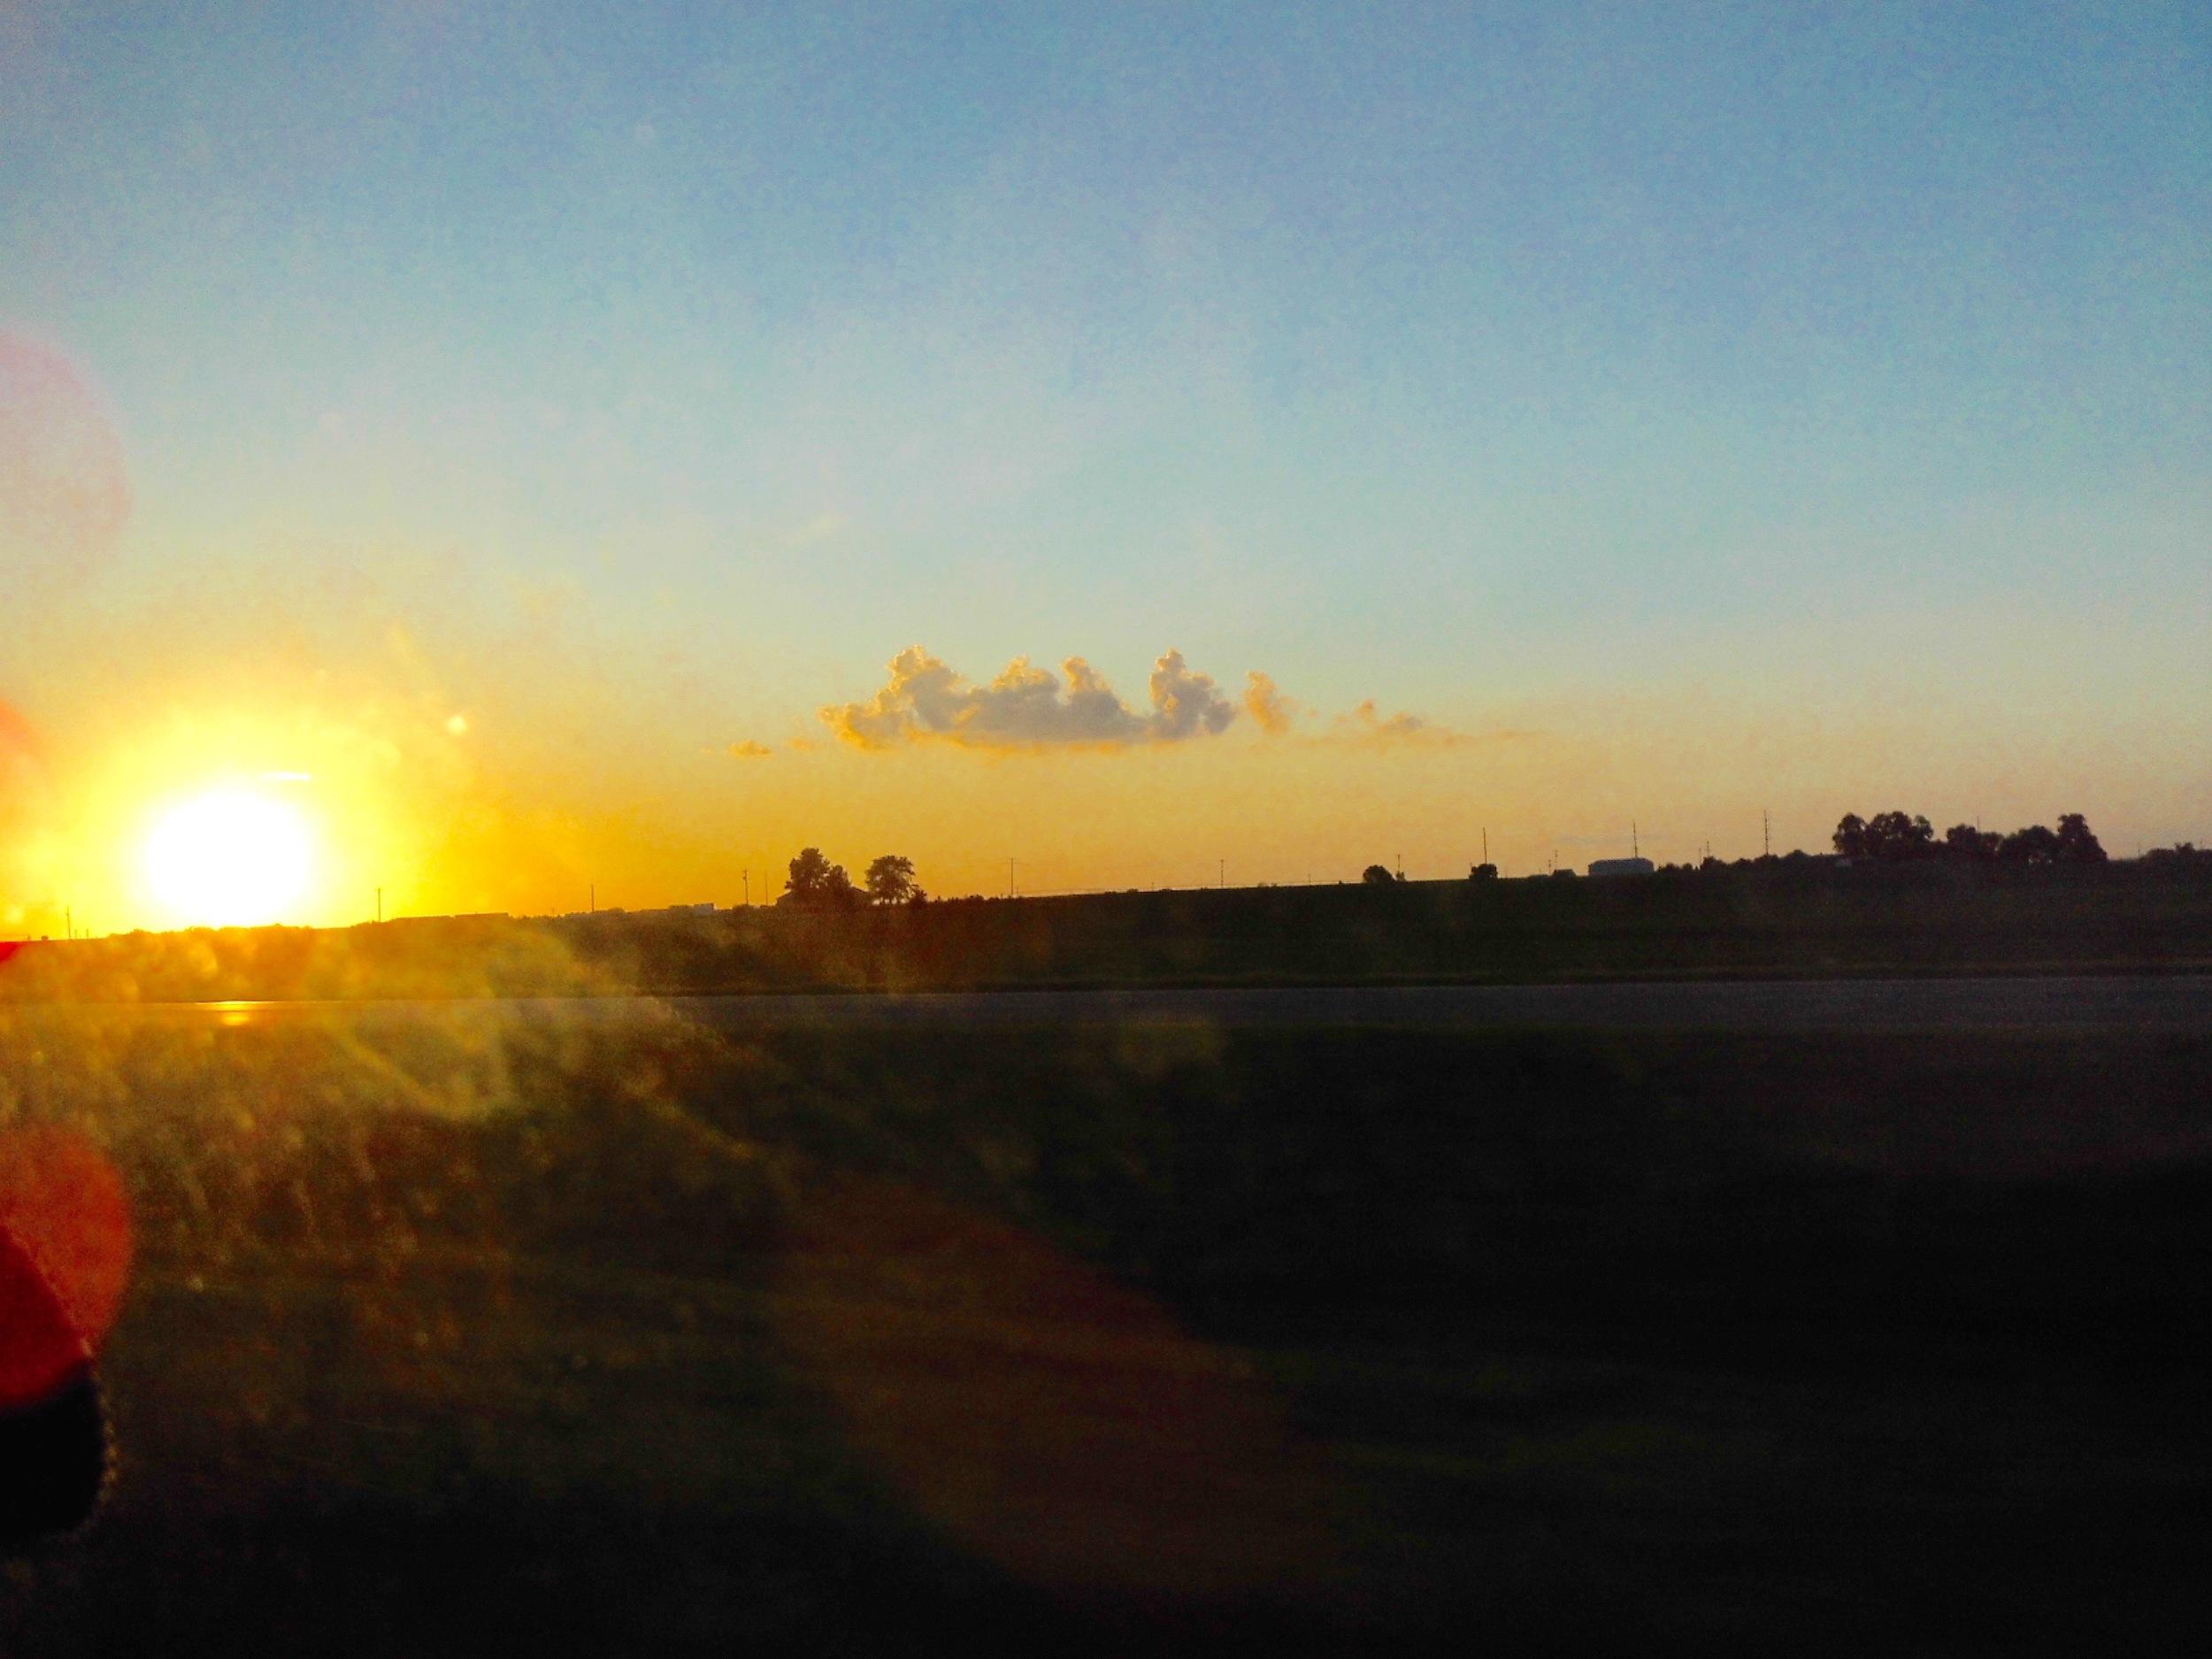 Ah, Sunset!